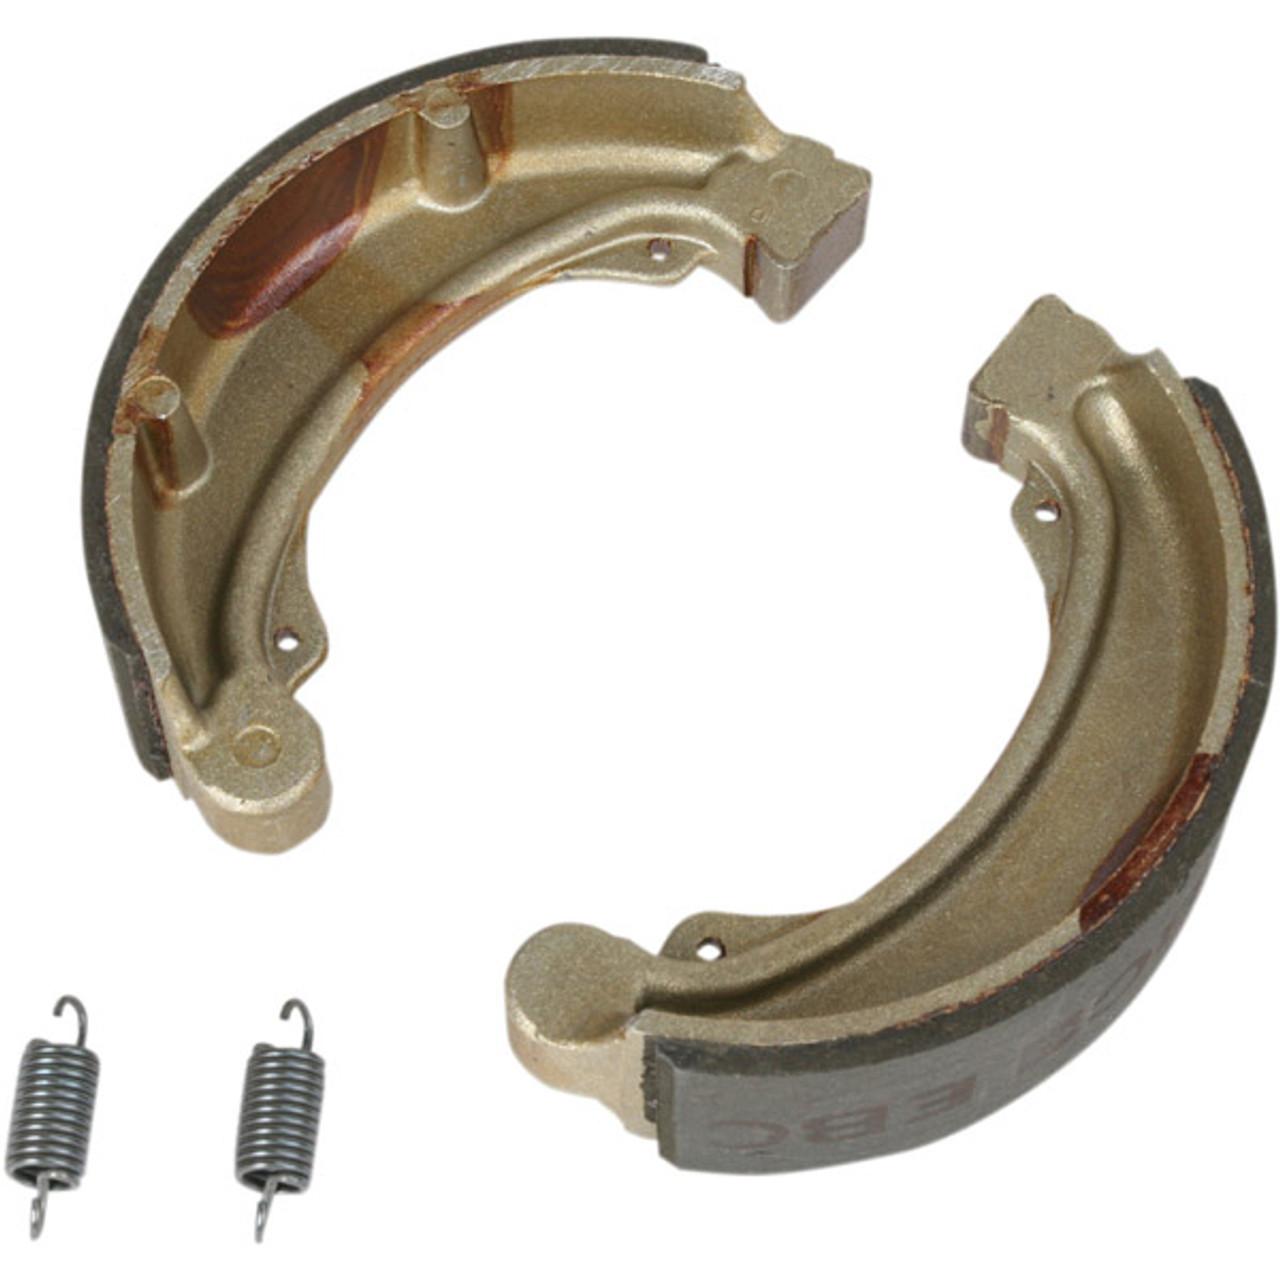 medium resolution of ebc honda cx500c 79 81 rear brake shoes